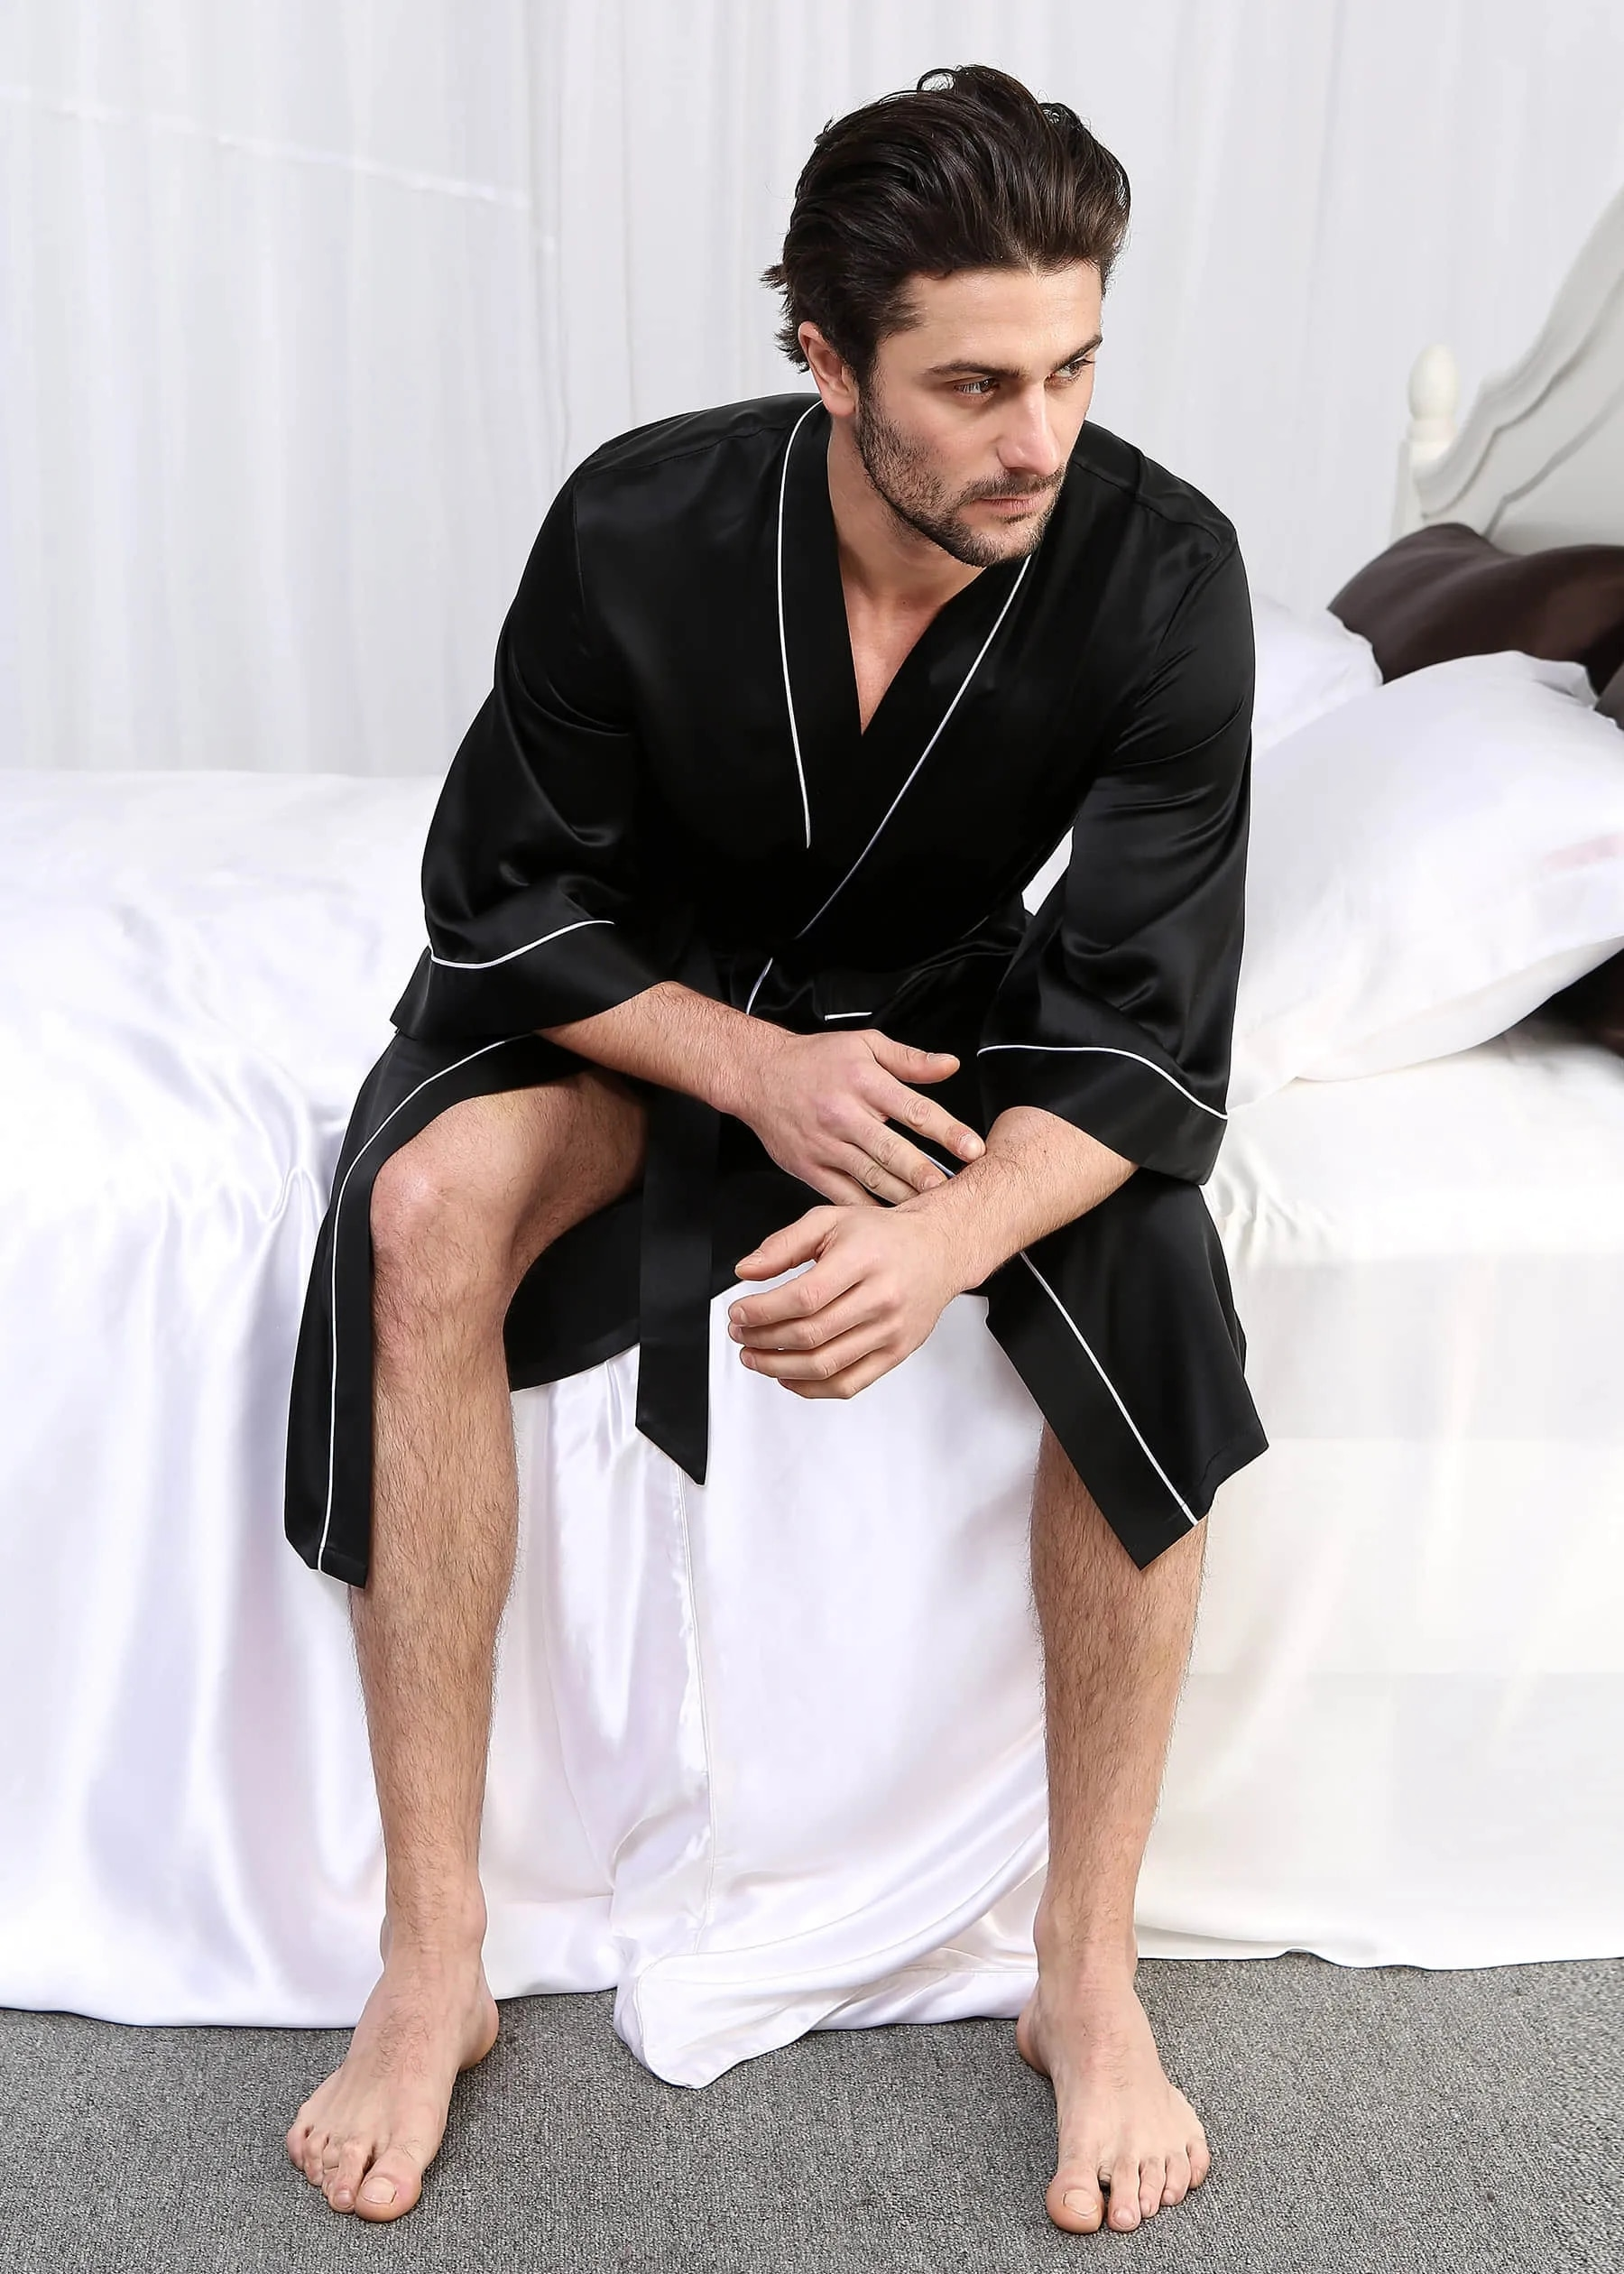 19 Momme Kimono Silk Robe with Piping Man Customized Long-Sleeved Bathrobe Home Sleepwear Nightgown